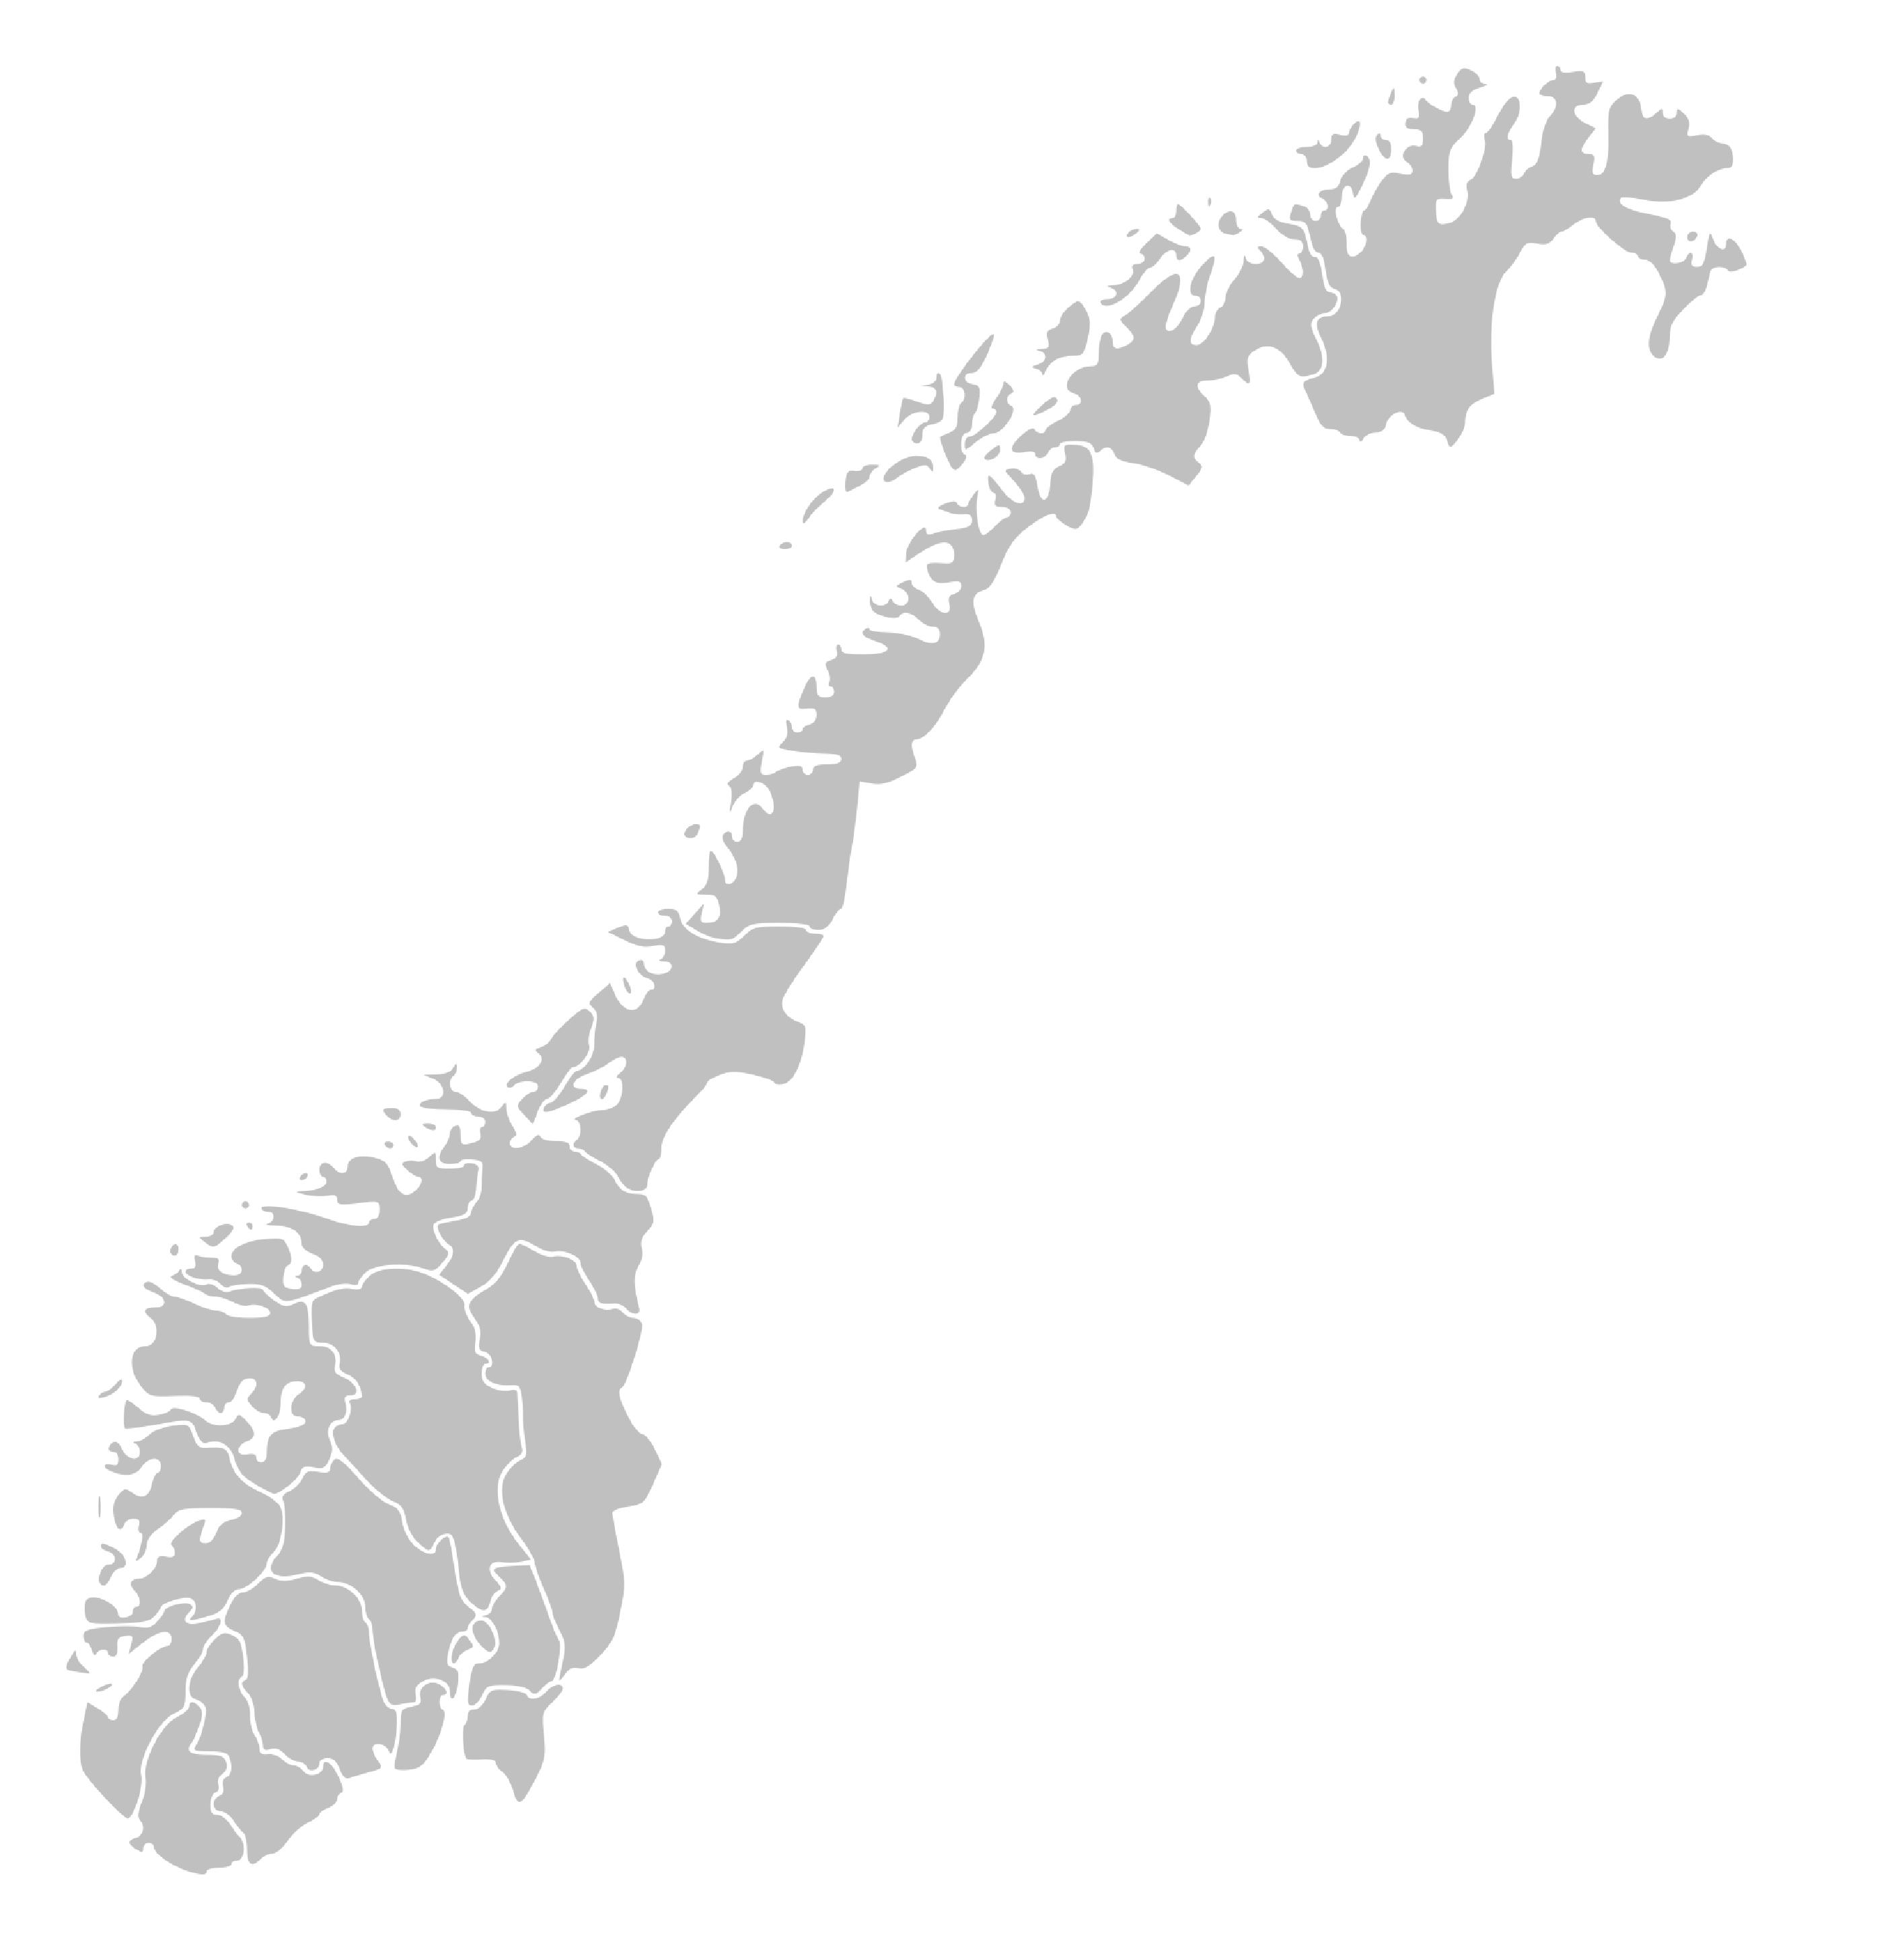 Norges kart